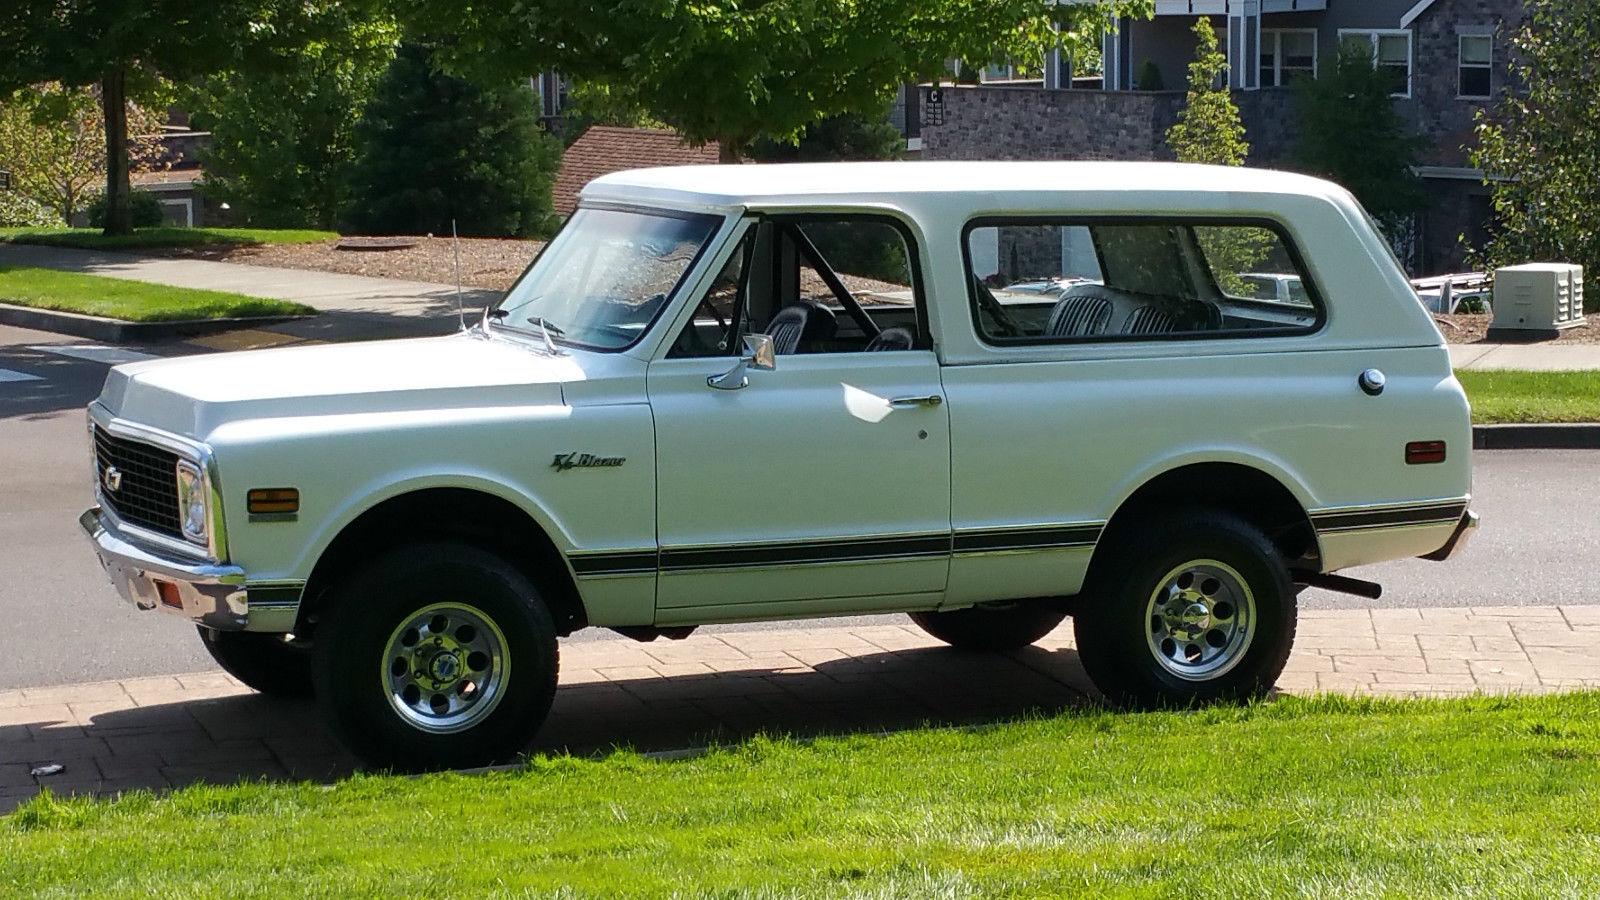 All American Classic Cars: 1971 Chevrolet K5 Blazer 2-Door SUV